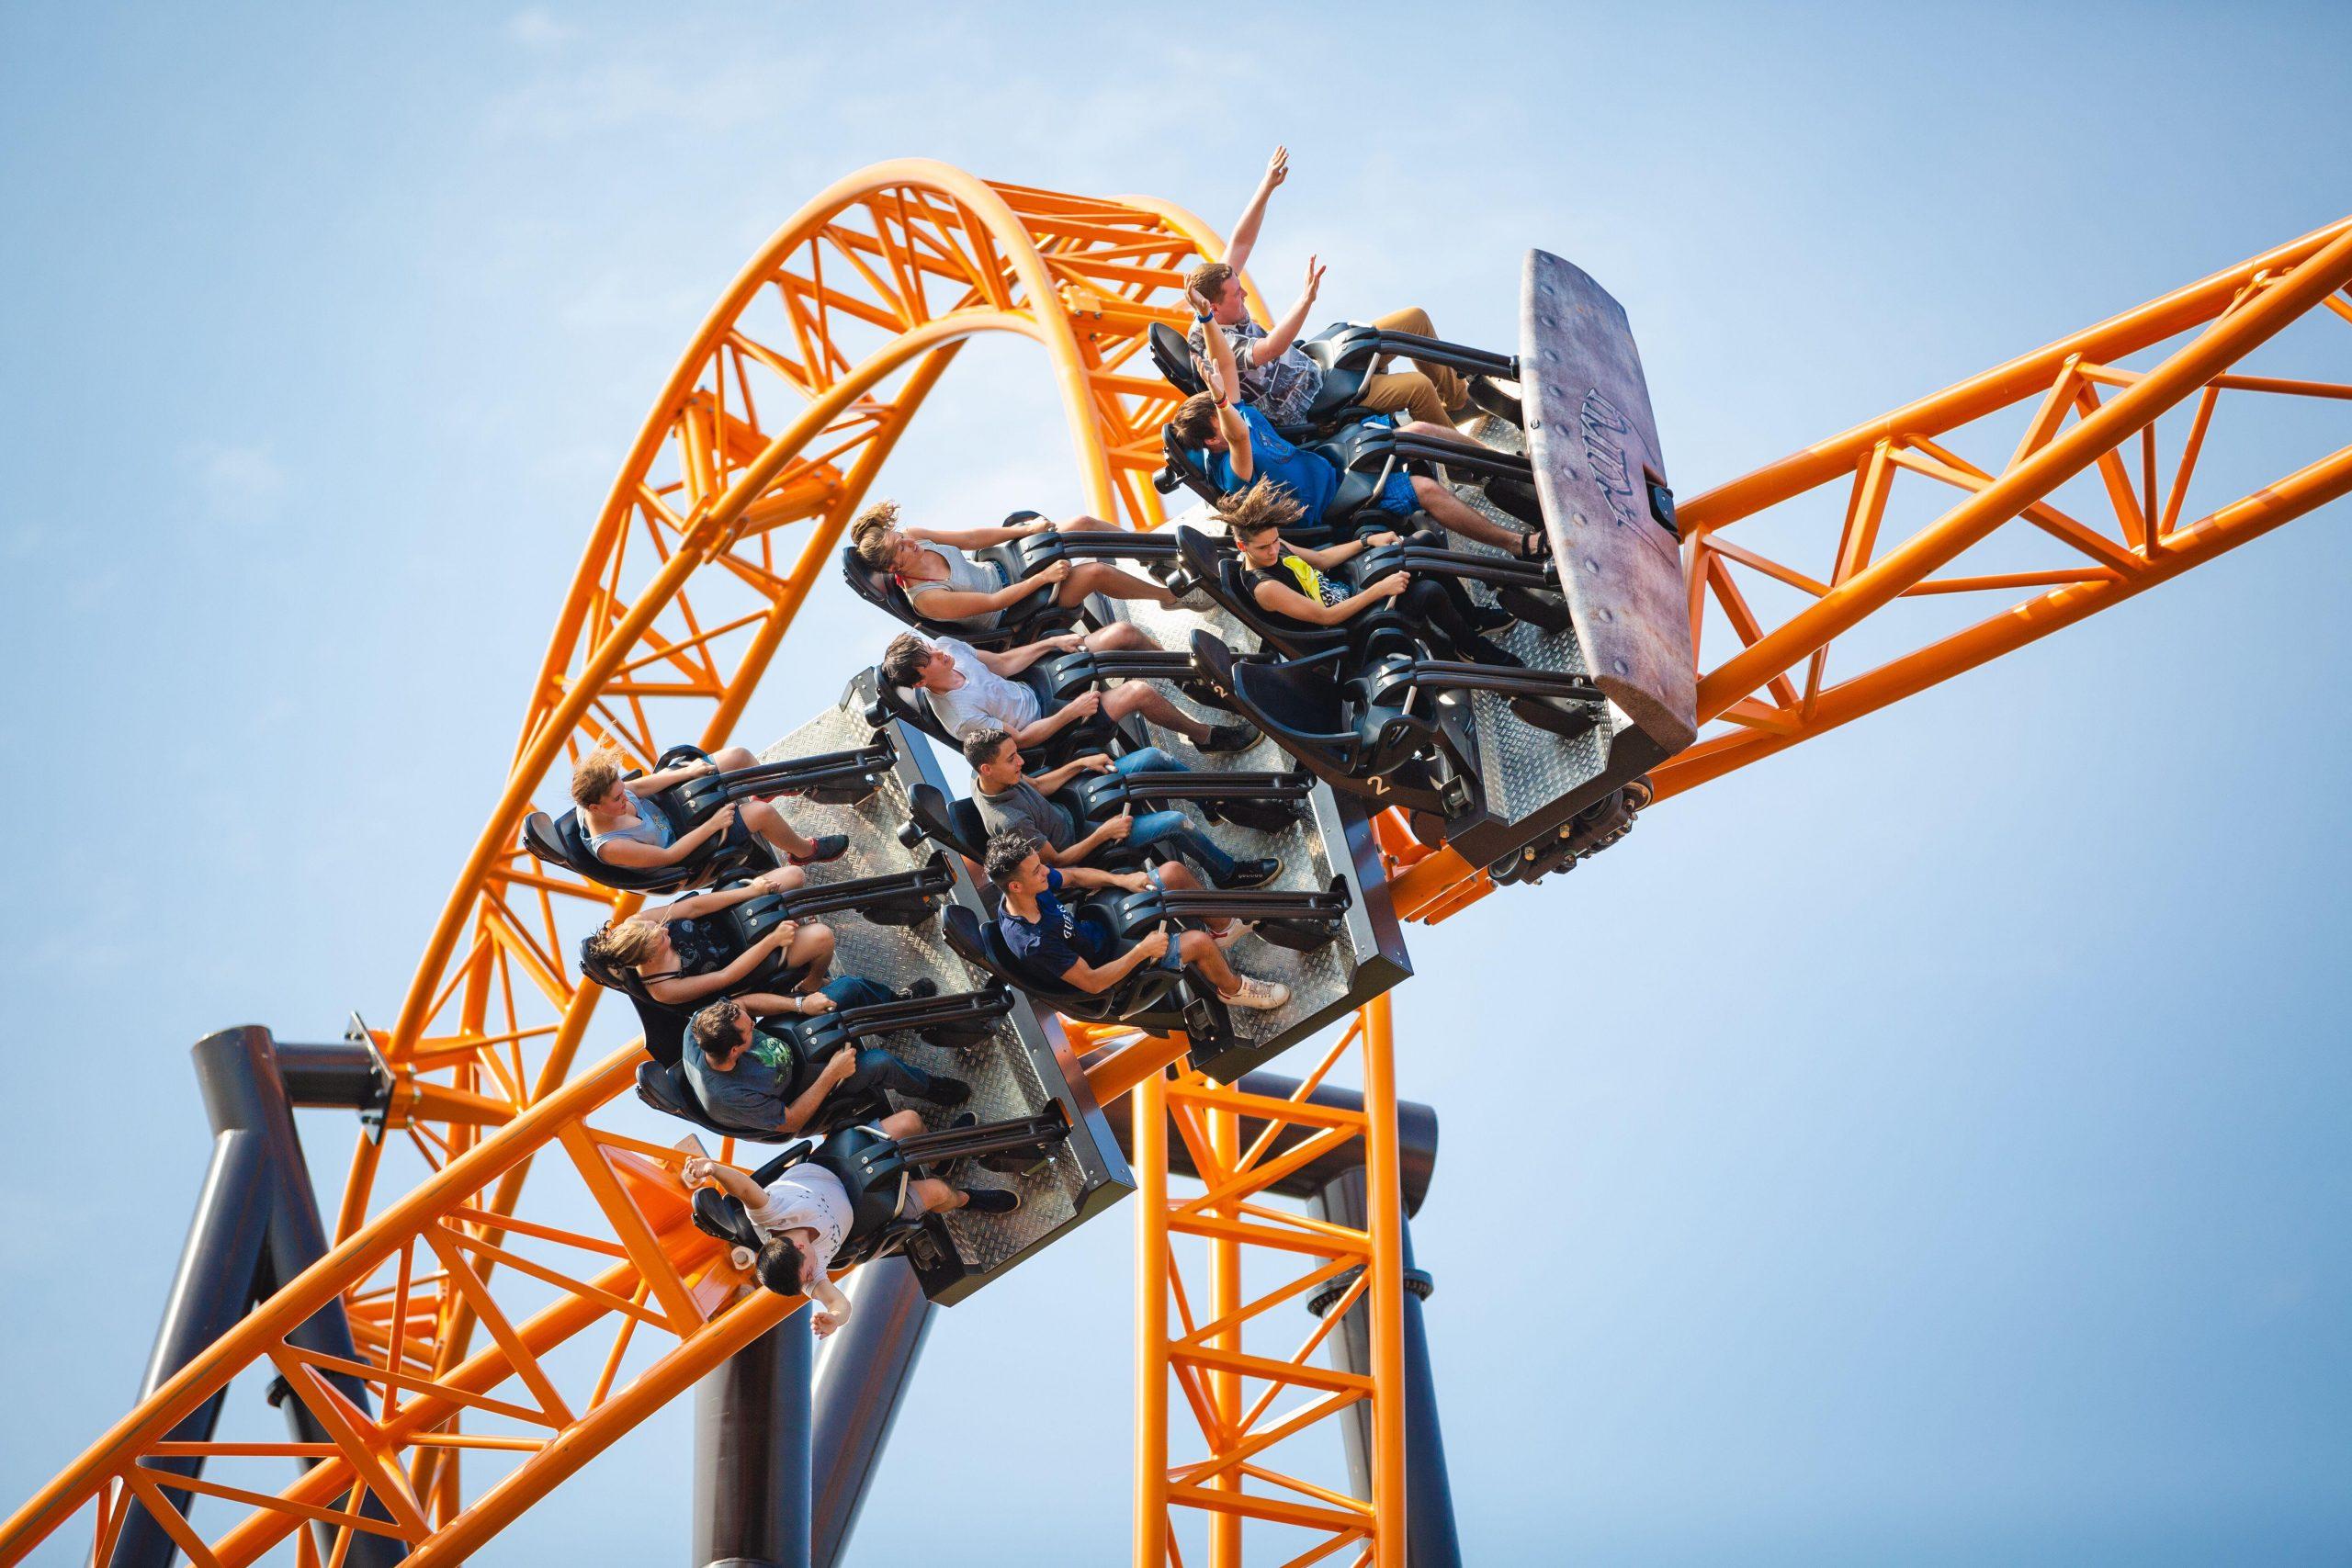 gerstlauer fury infinity coaster